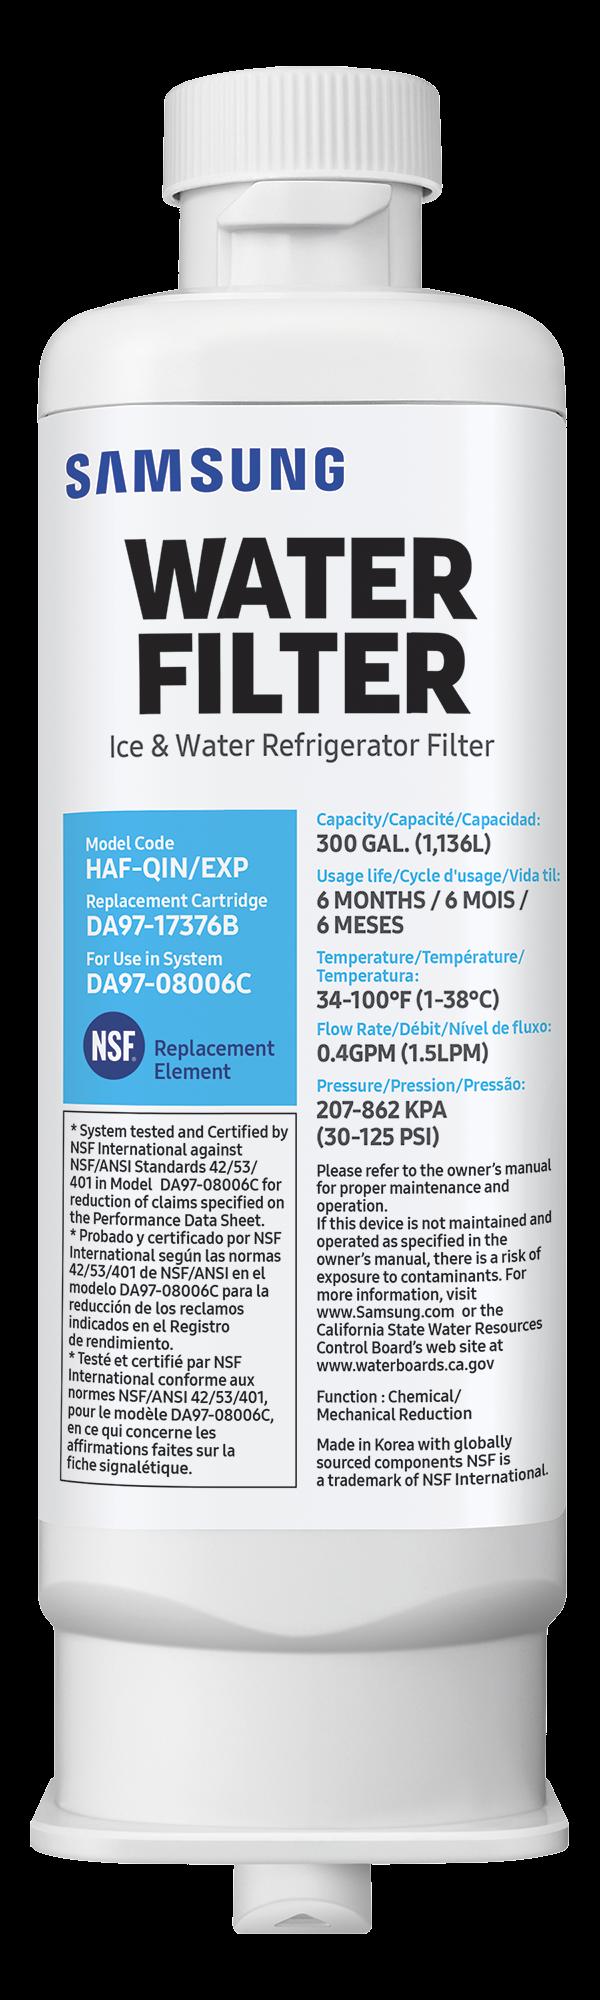 Samsung Haf-Qin Water Filter